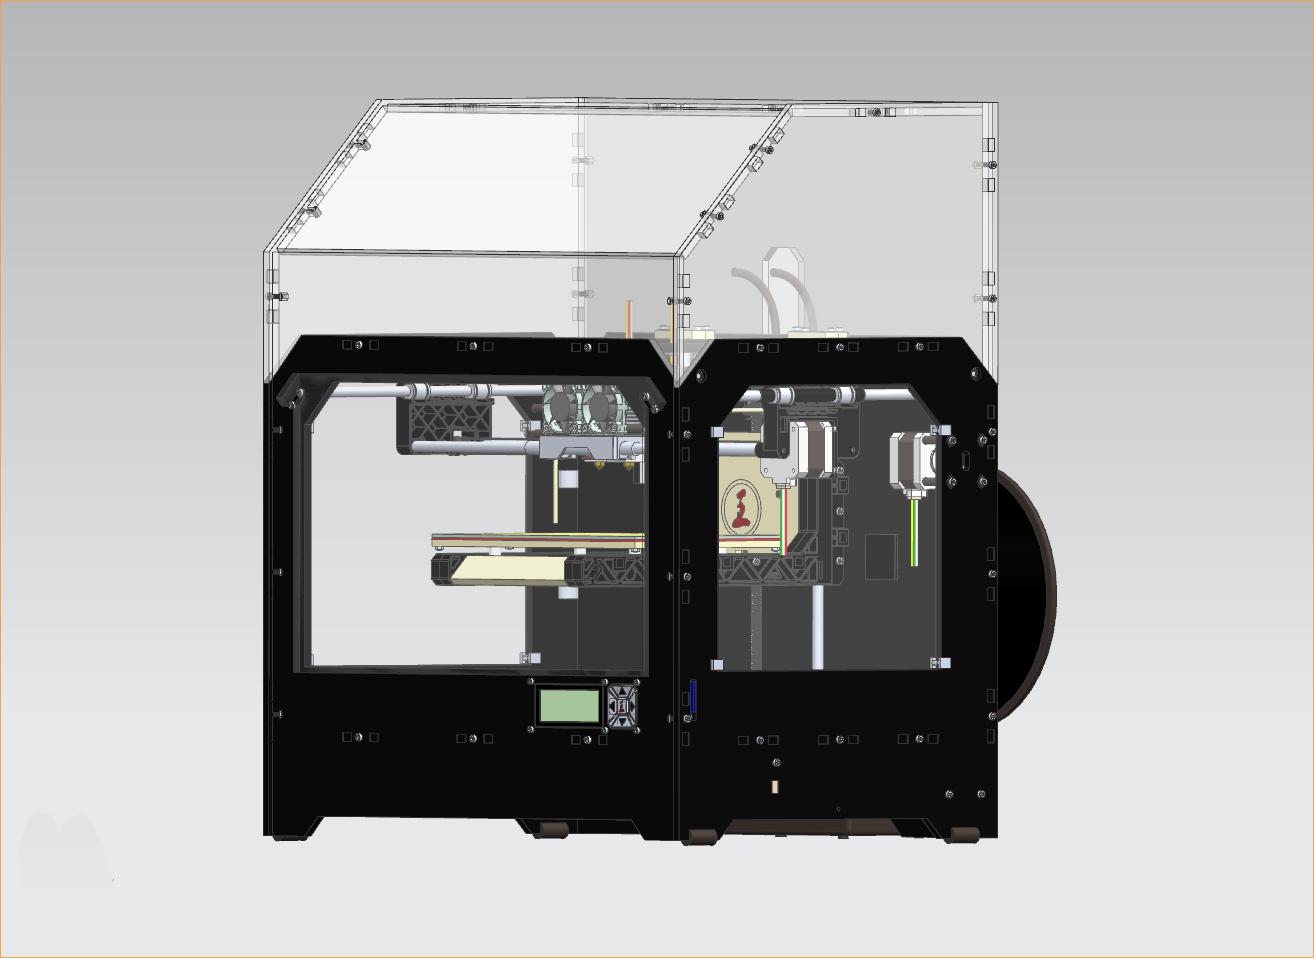 3d打印机真的好吗 3d打印机配件哪里买便宜价格